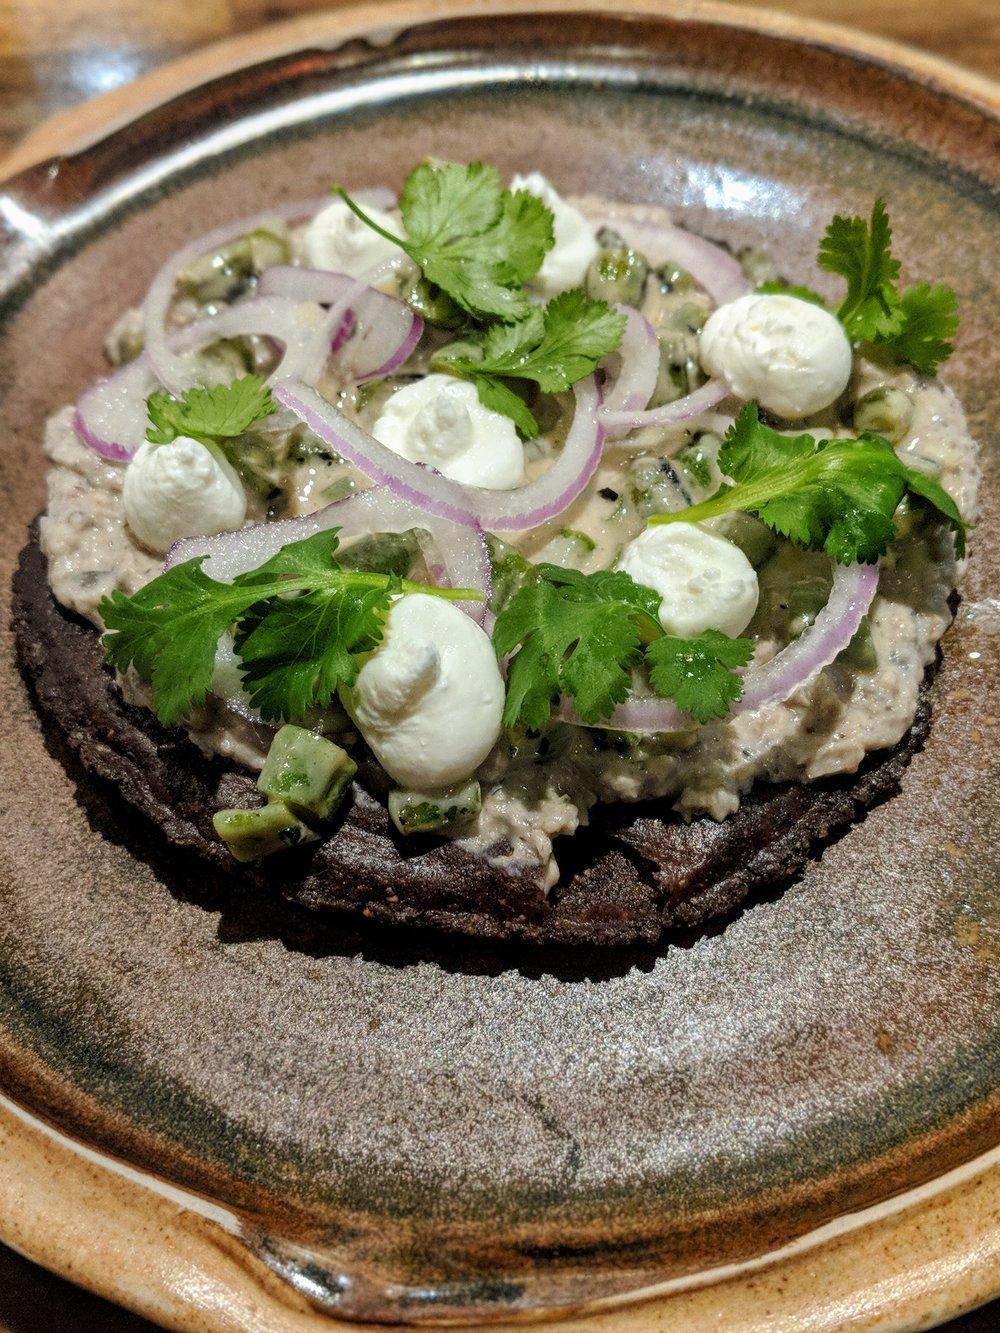 Tostada, field pea hummus, marinated green beans